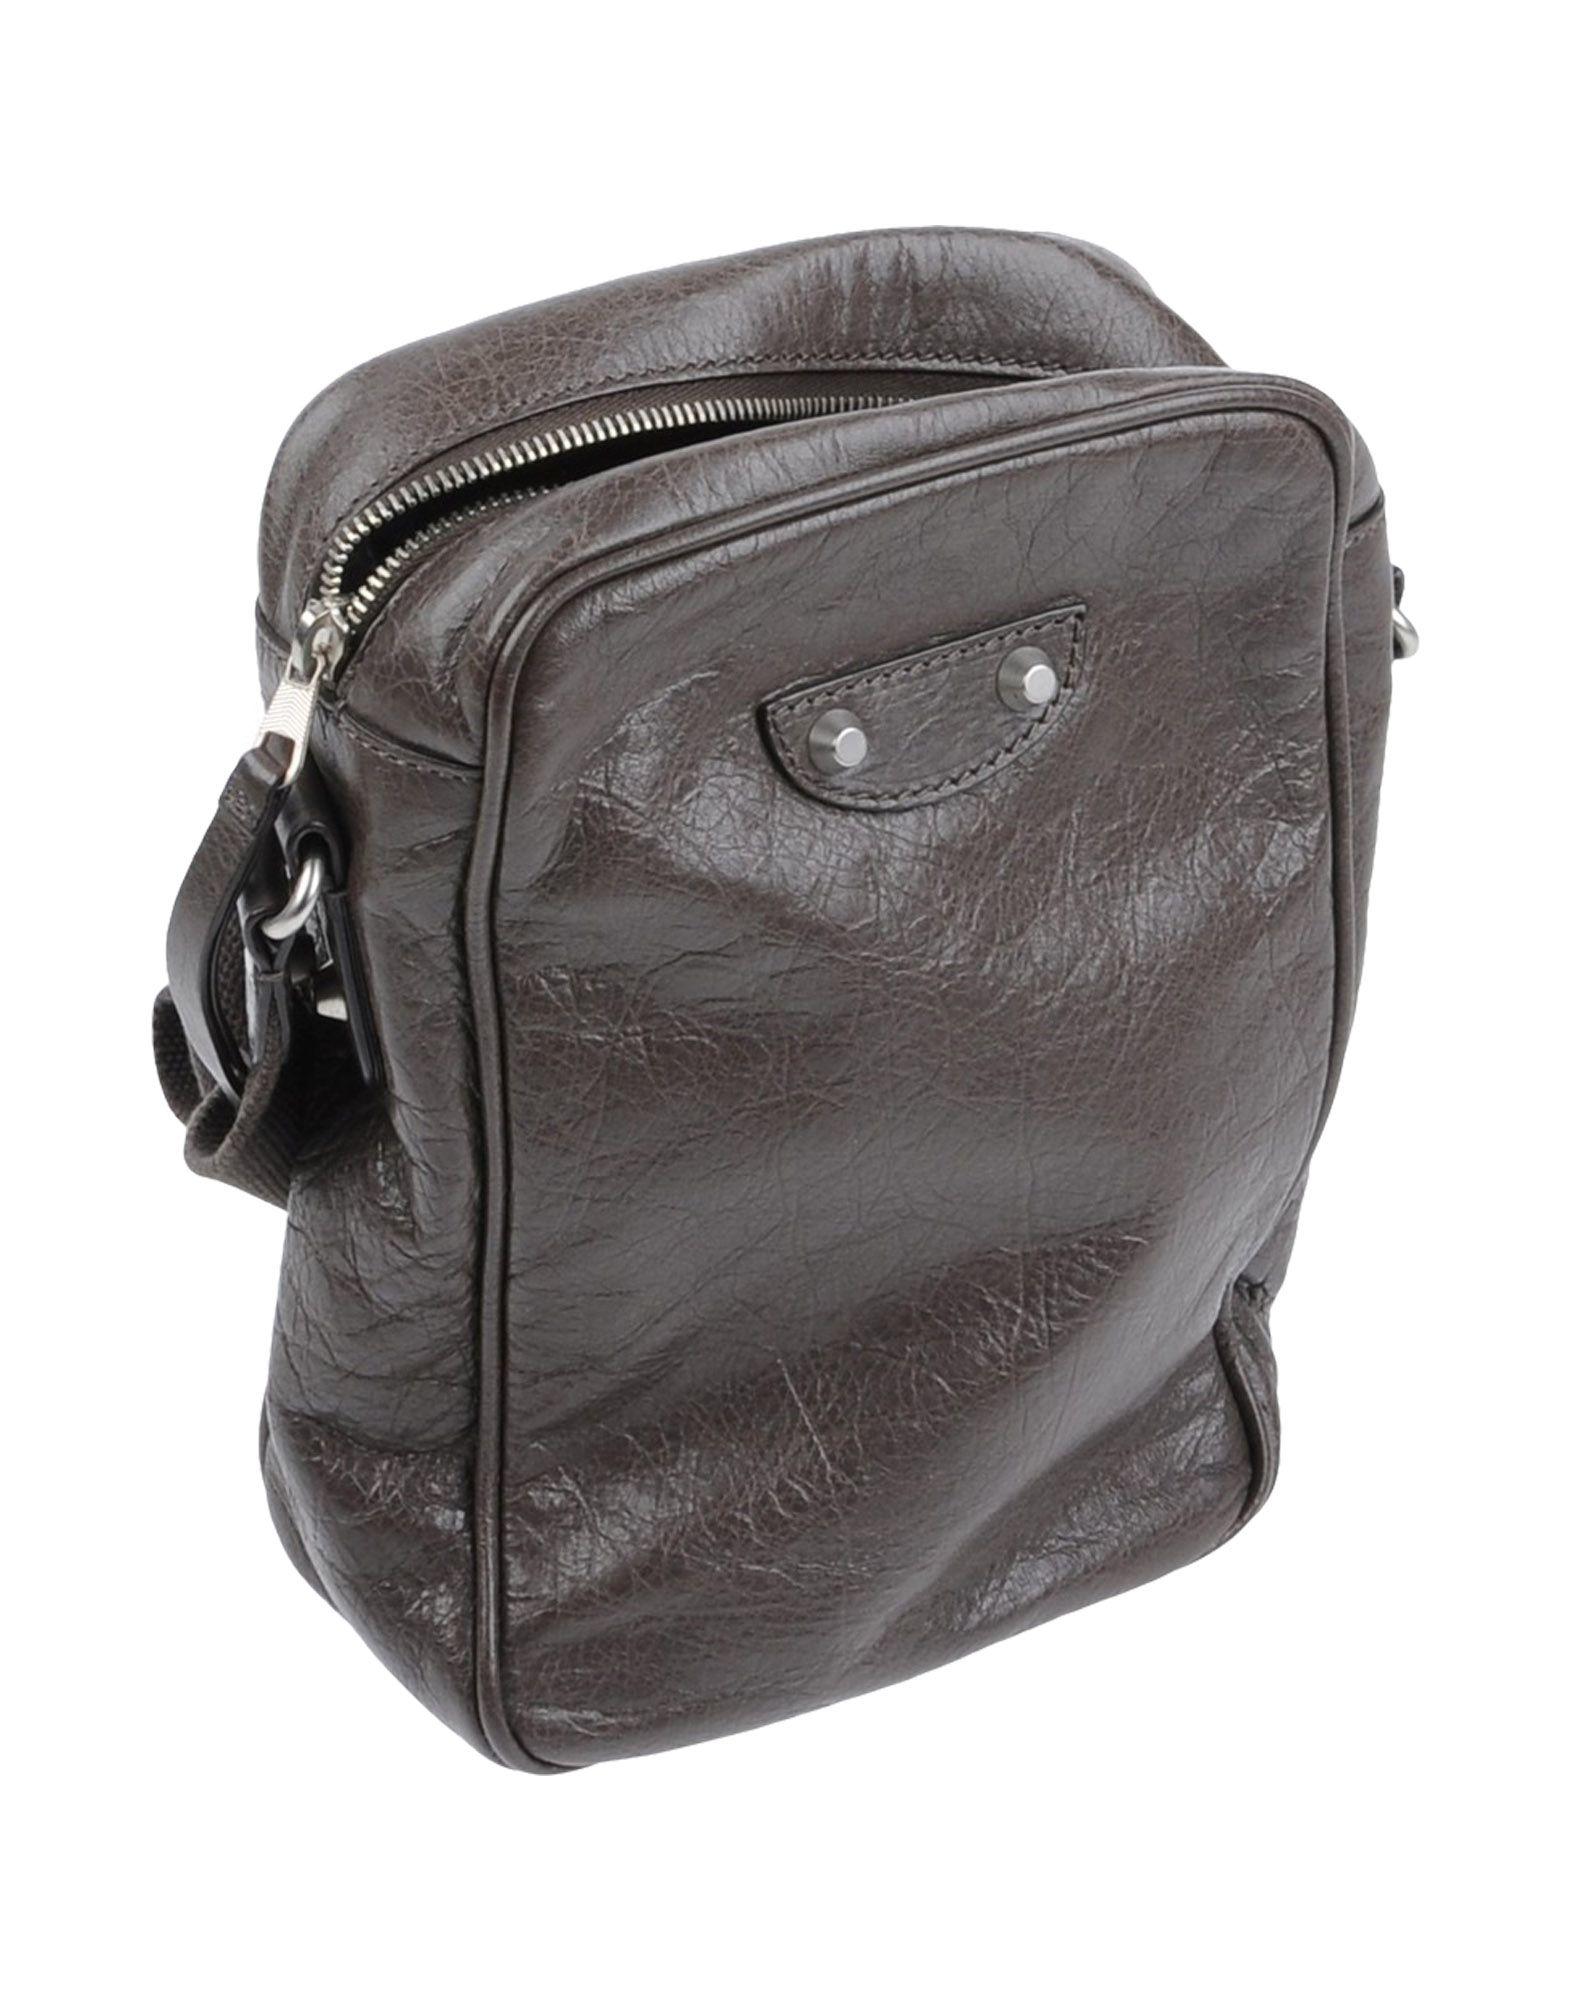 Lyst - Balenciaga Cross-body Bag in Brown for Men 691017cc1054f